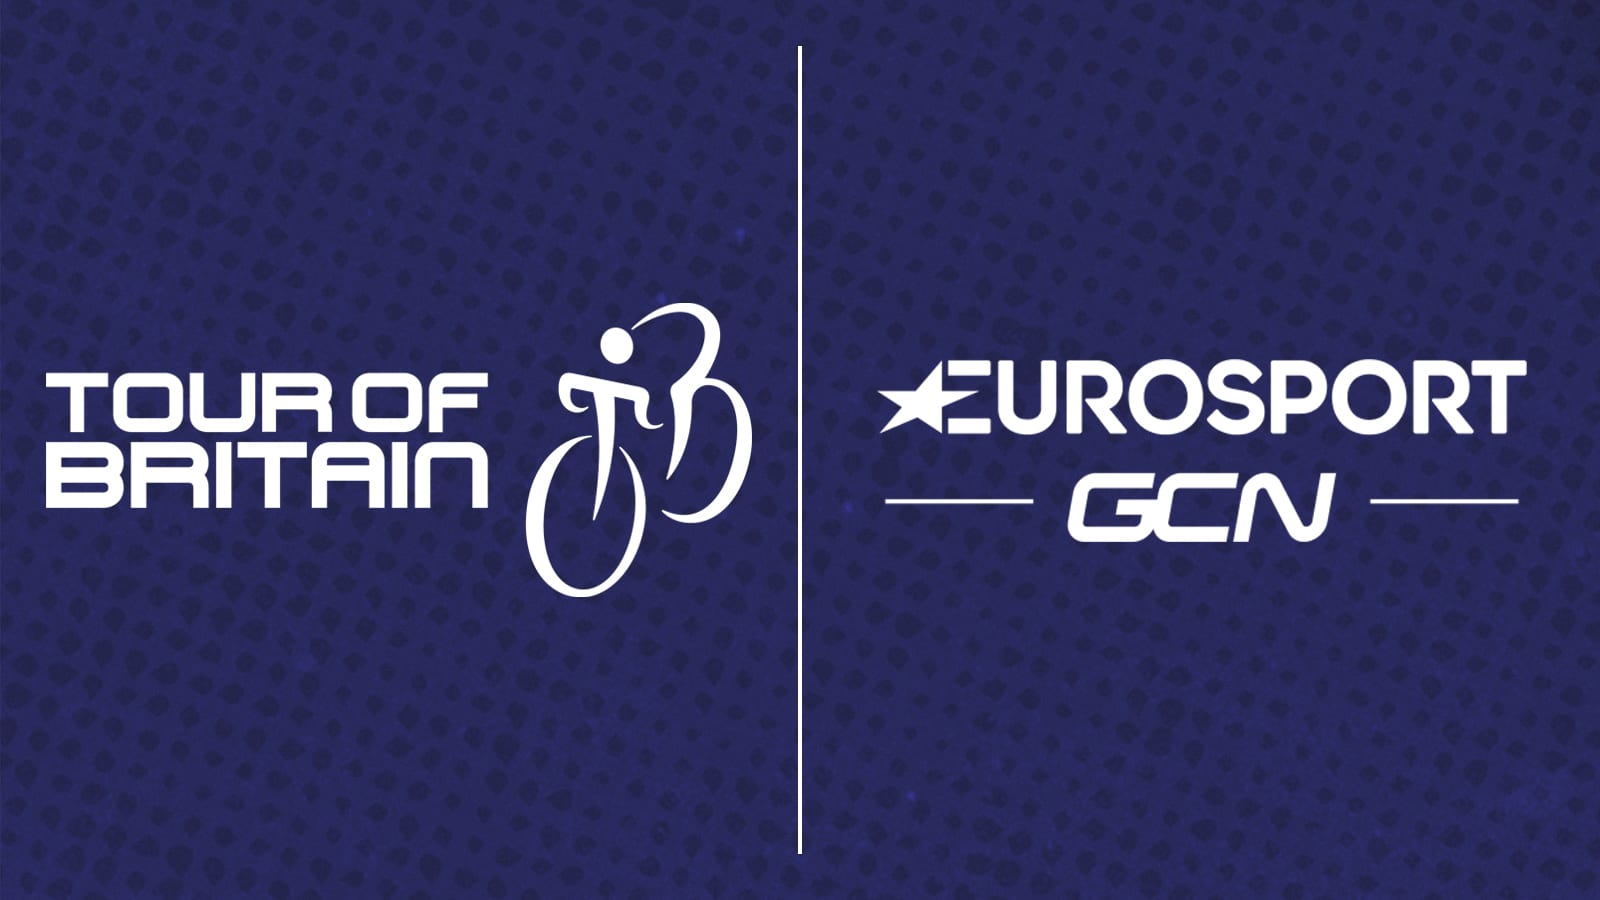 Tour of Britain Eurosport GCN